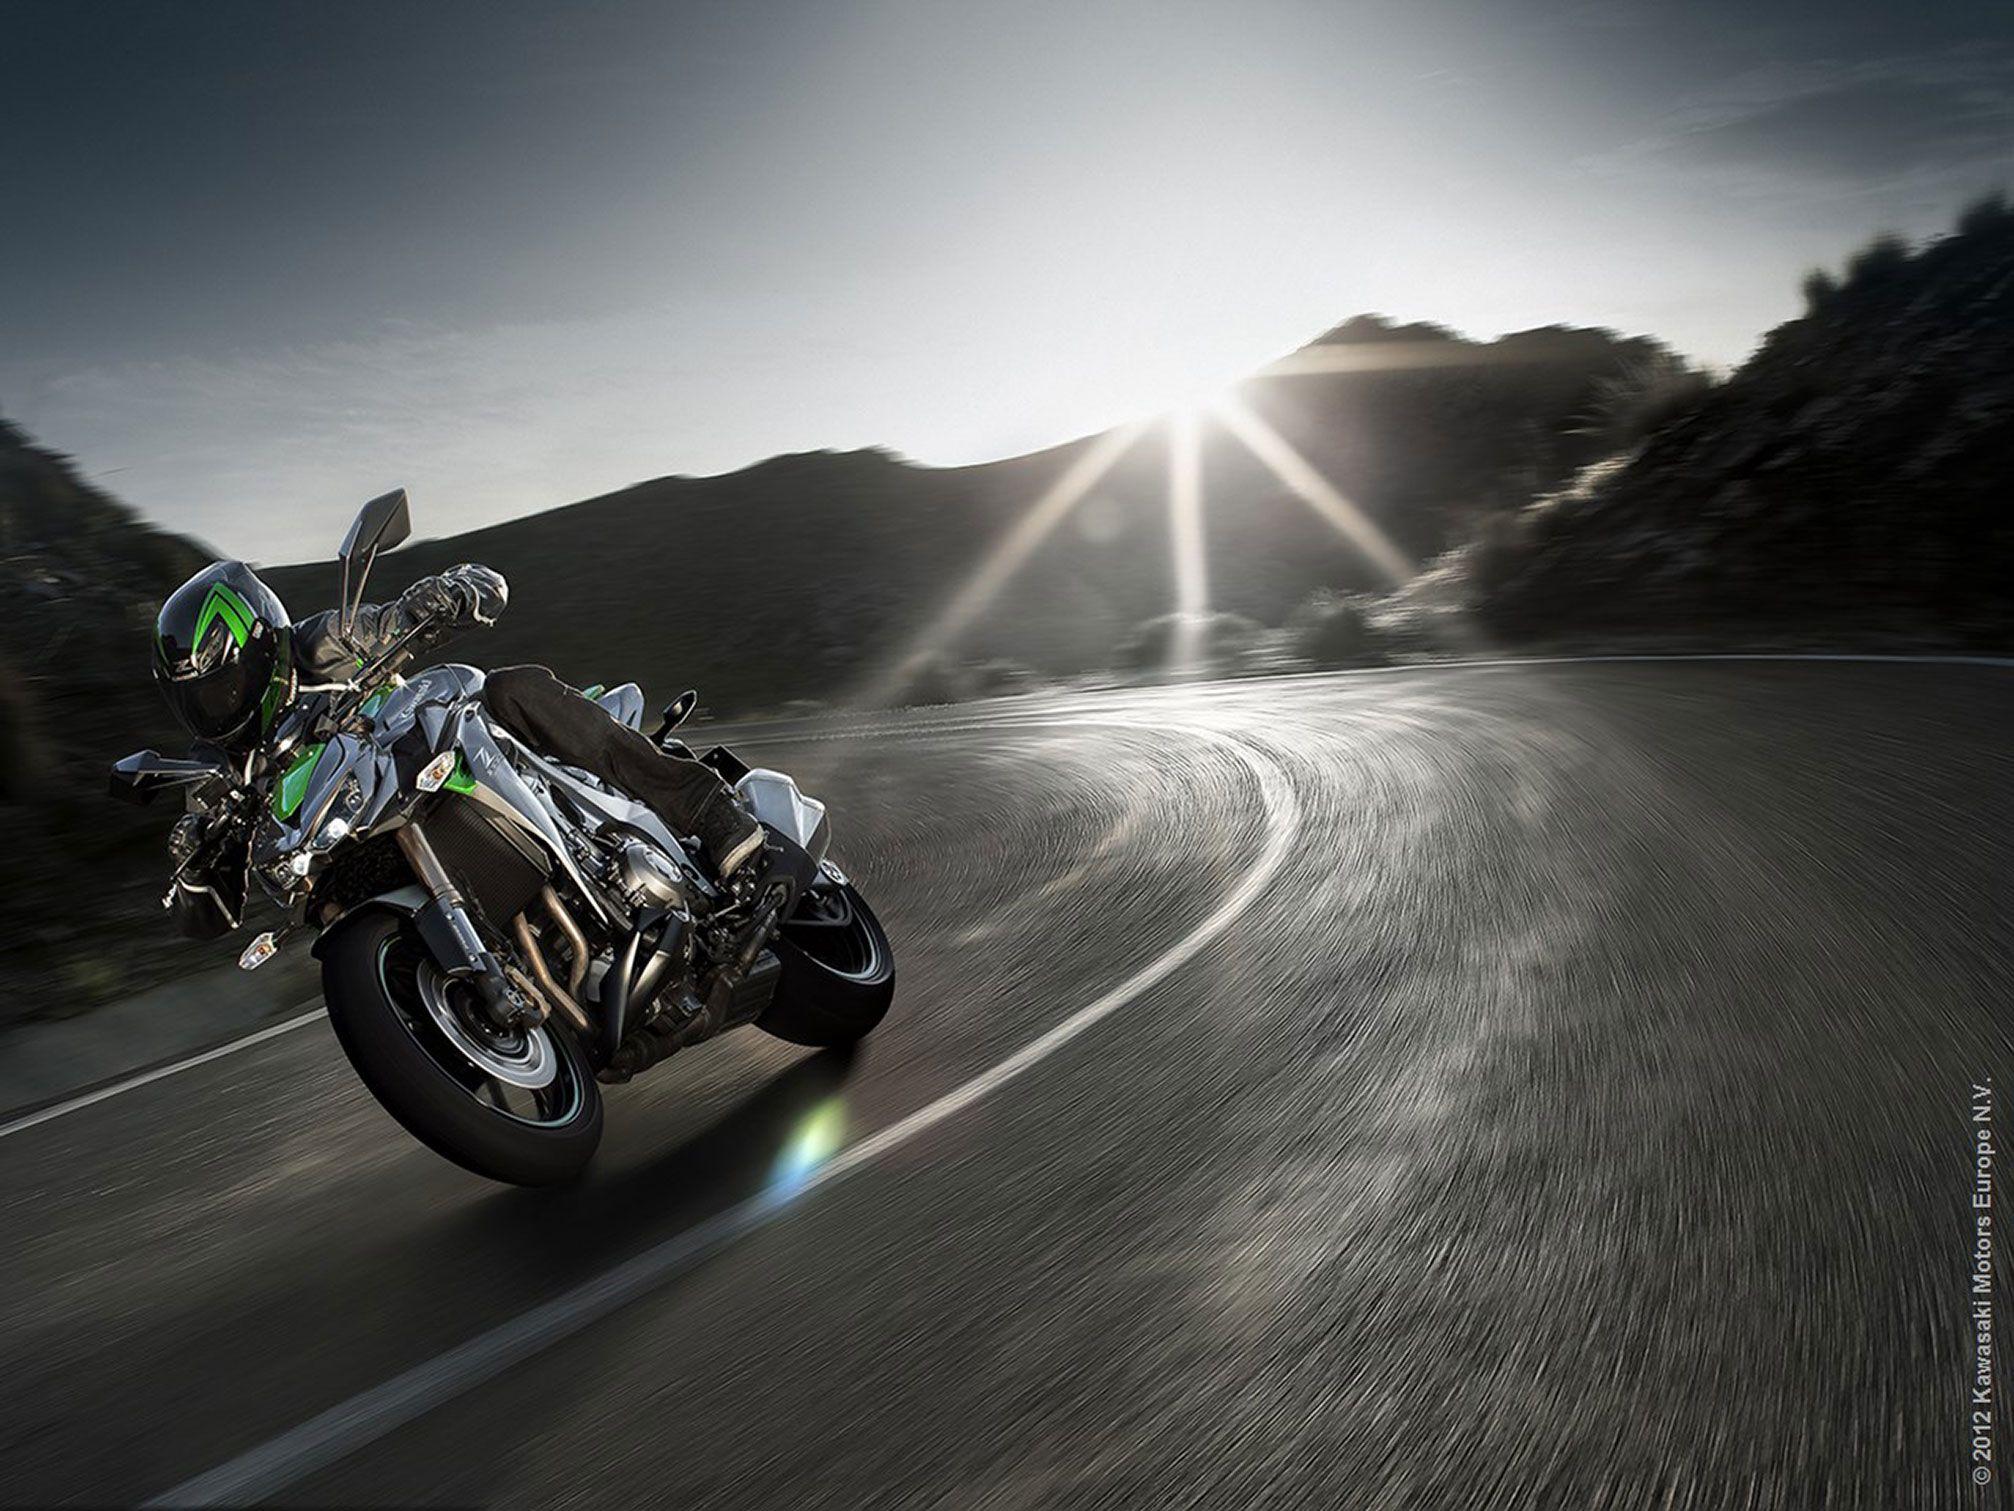 Explore Kawasaki Z1000 Ninja And More